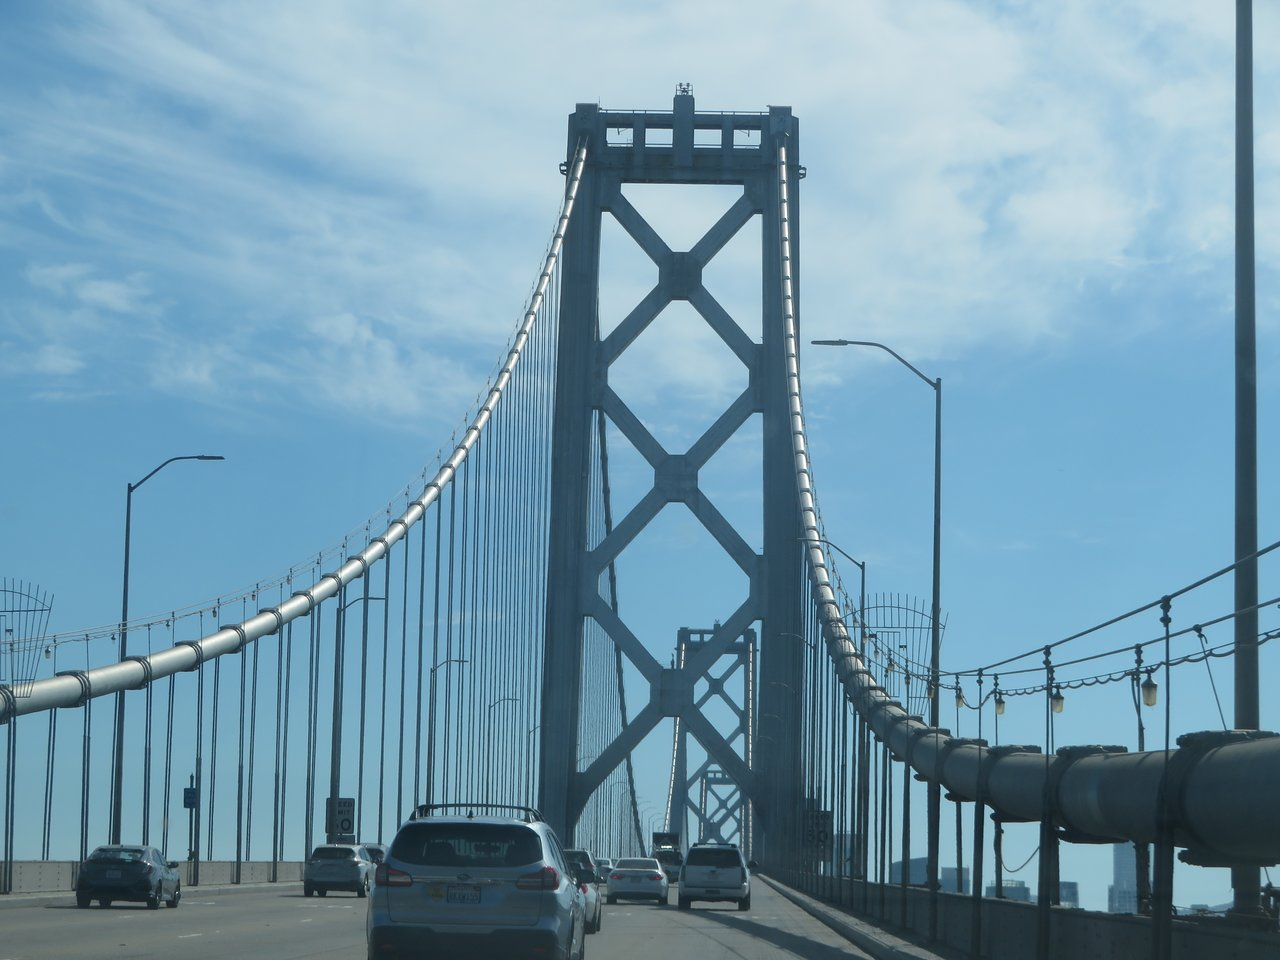 San Francisco Bay Bridge 2020 All You Need To Know Before You Go With Photos San Francisco Ca Tripadvisor